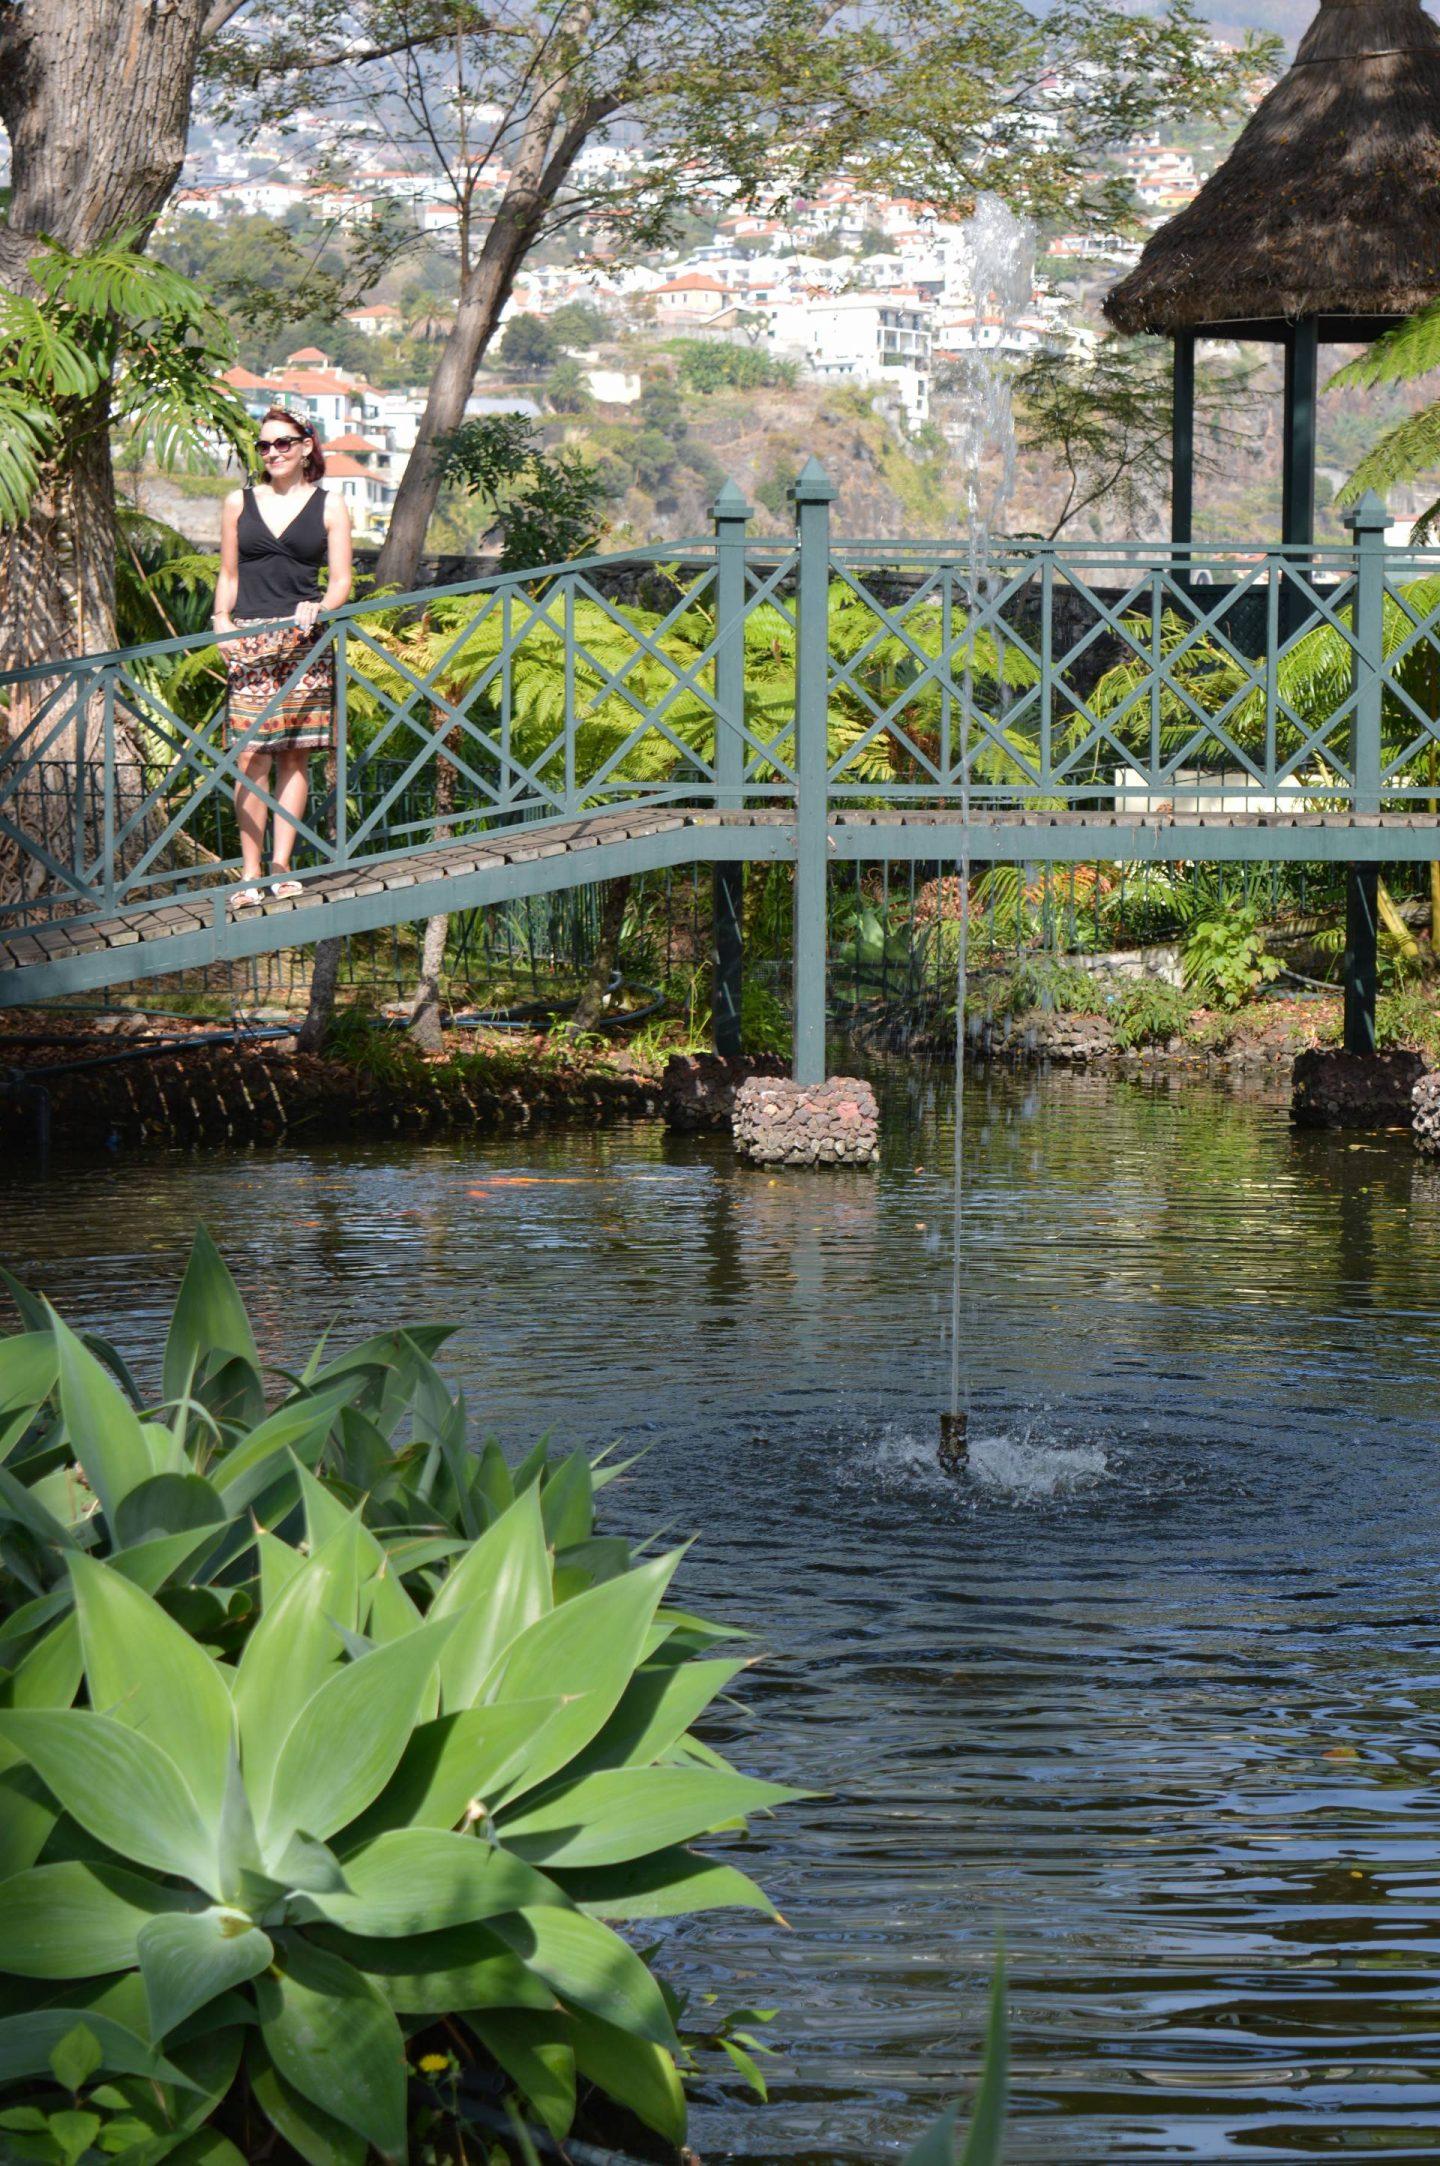 Meeting Colombo the Tortoise, Jardins do Lago hotel, Funchal